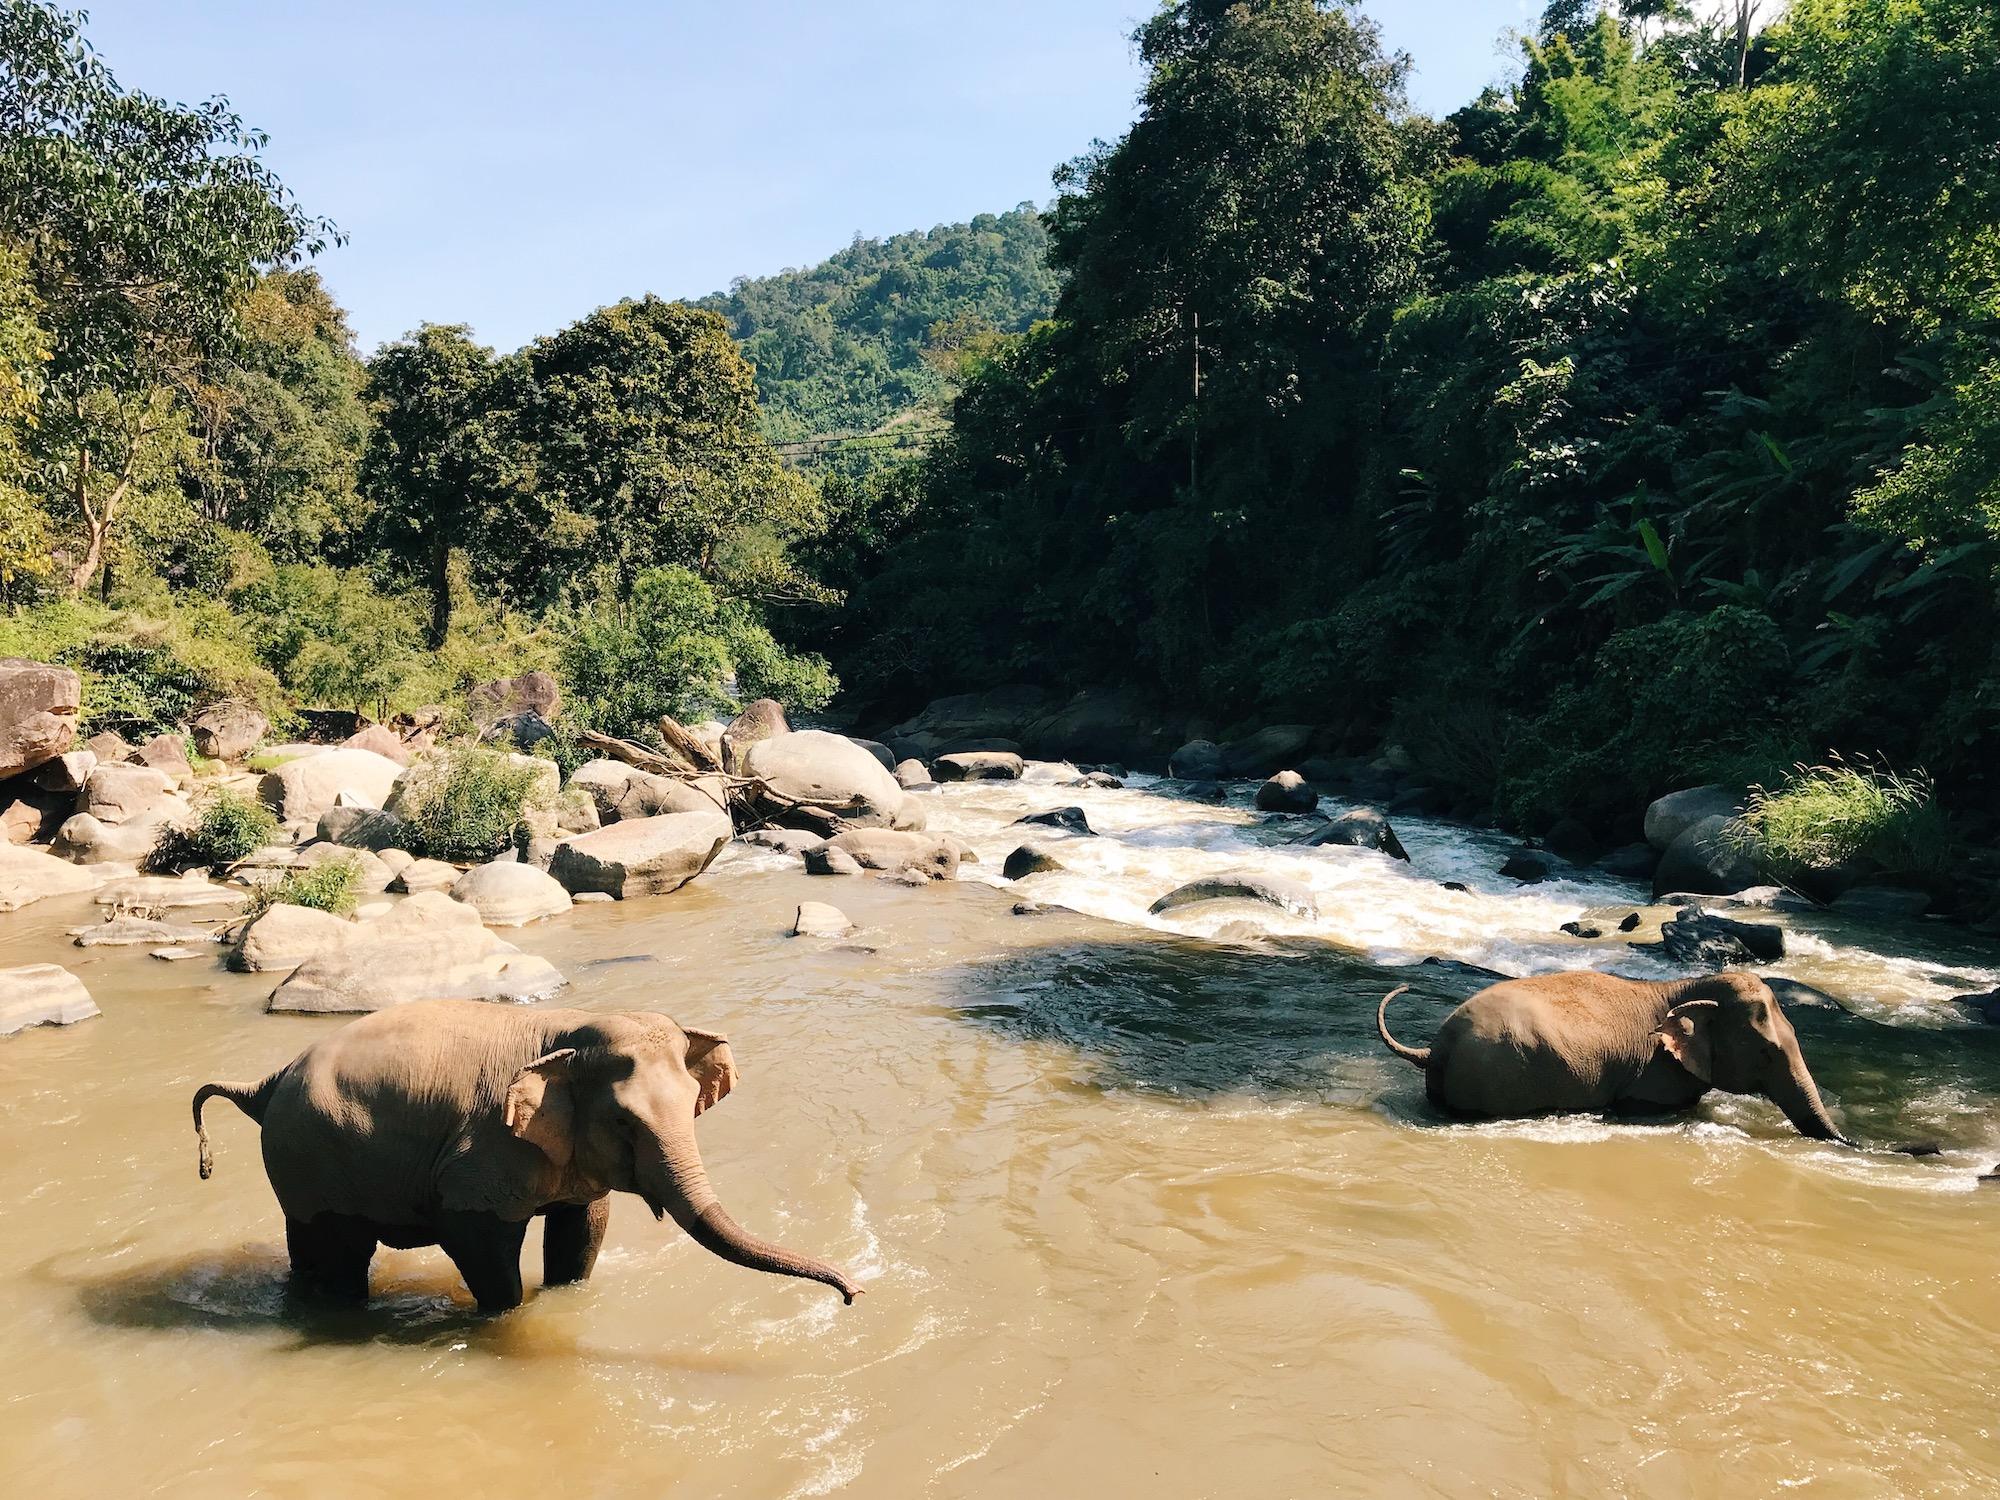 Chiang Mai Thailand Travel Guide - Claire Eliza - Elephant Nature Park 3.JPG